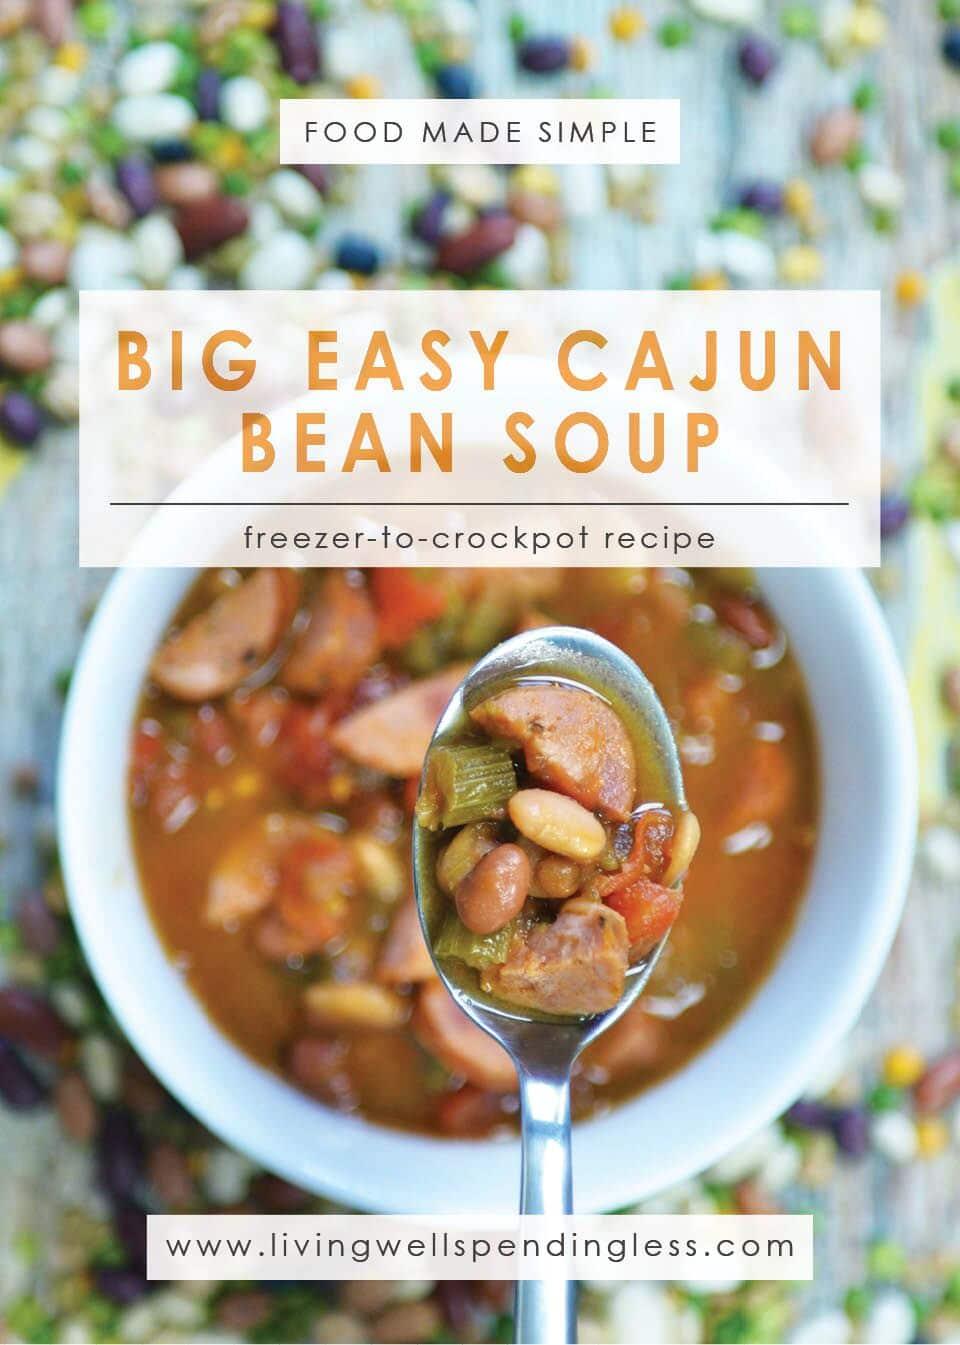 Big Easy Cajun Bean Soup: A delicious freezer-to-crock pot recipe